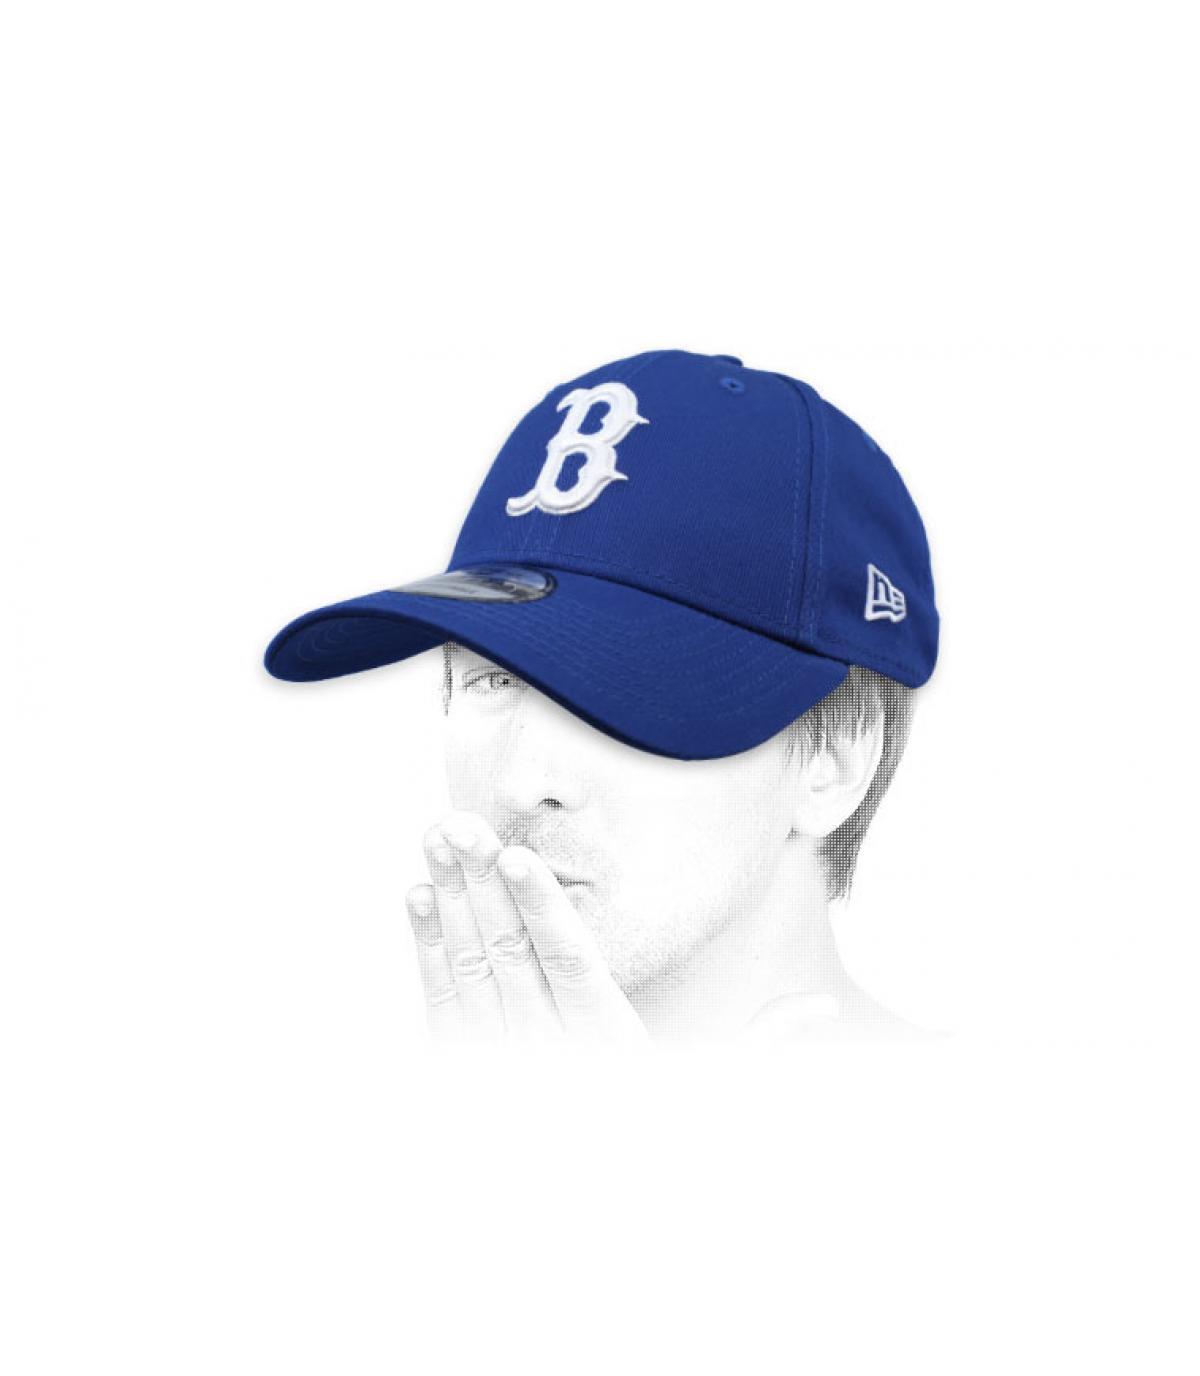 casquette B bleu